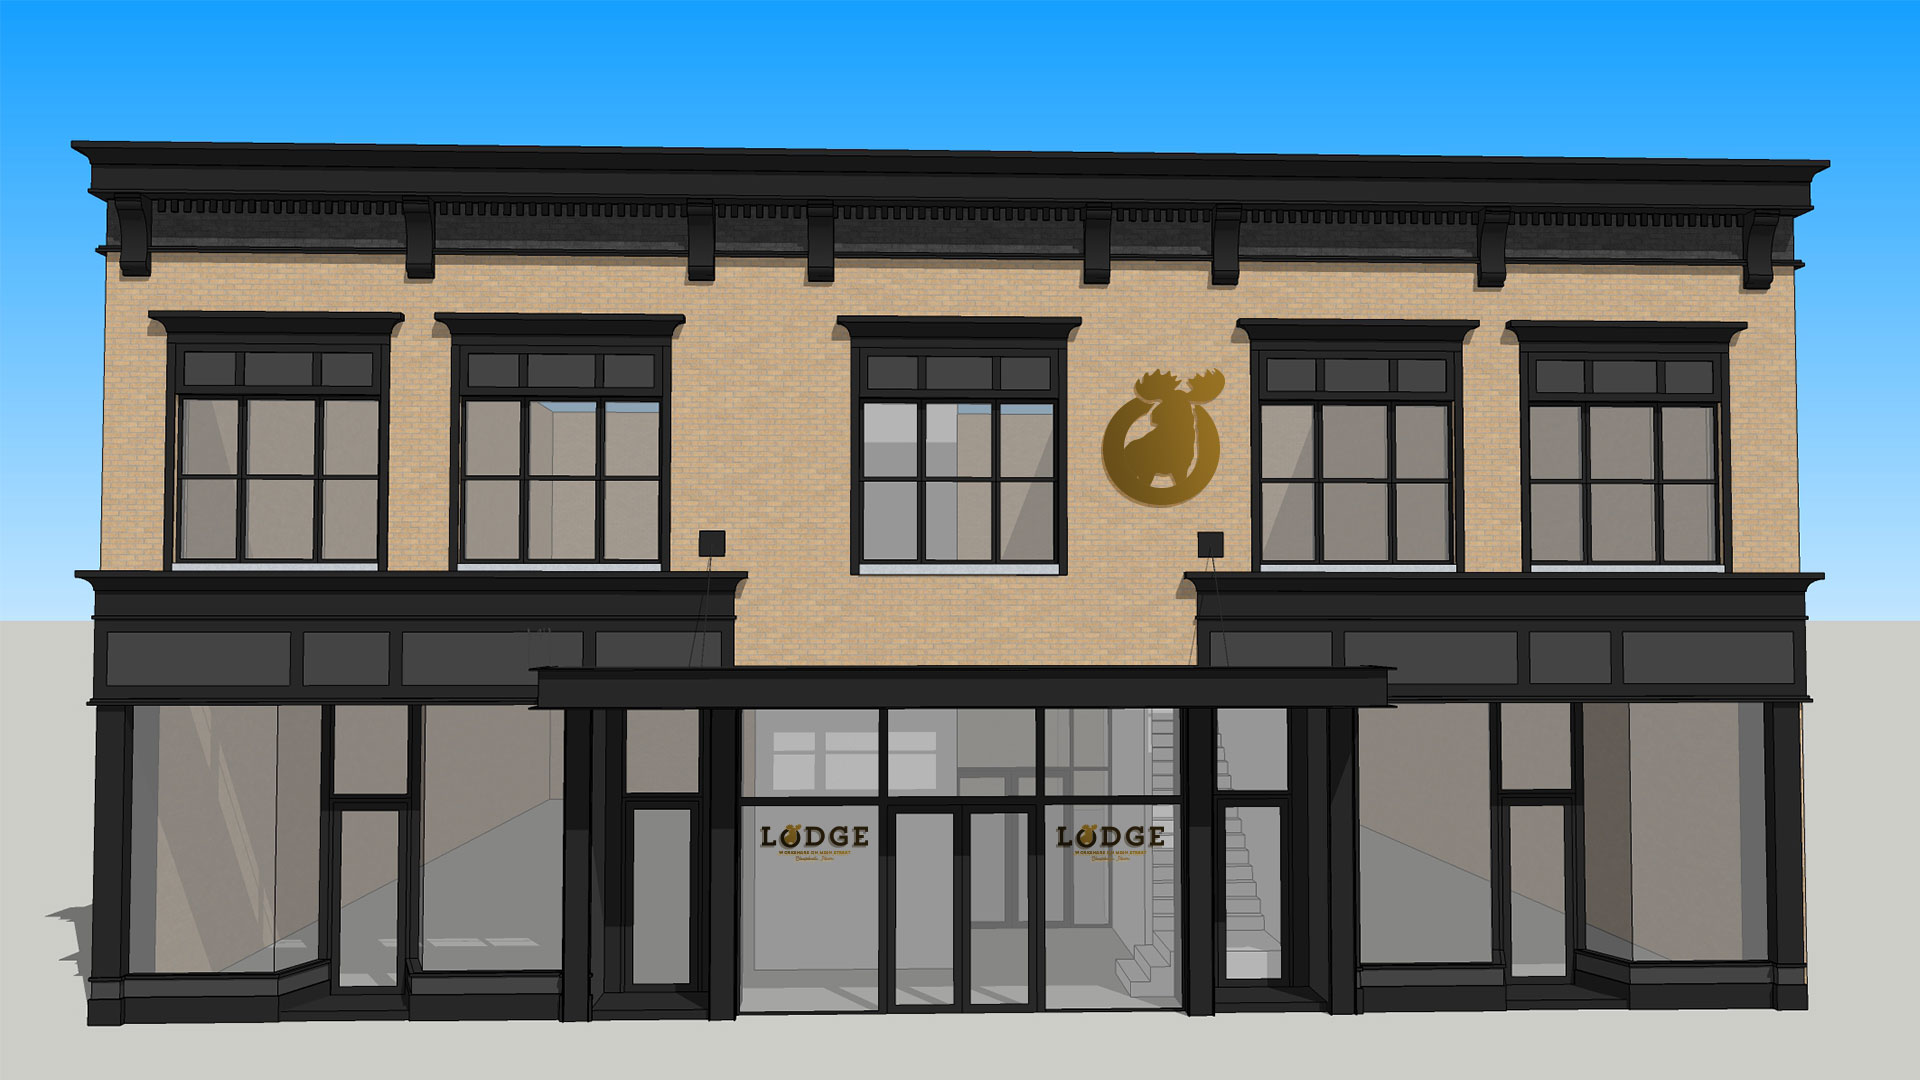 Lodge-001-BuildingFrontMockup.jpg